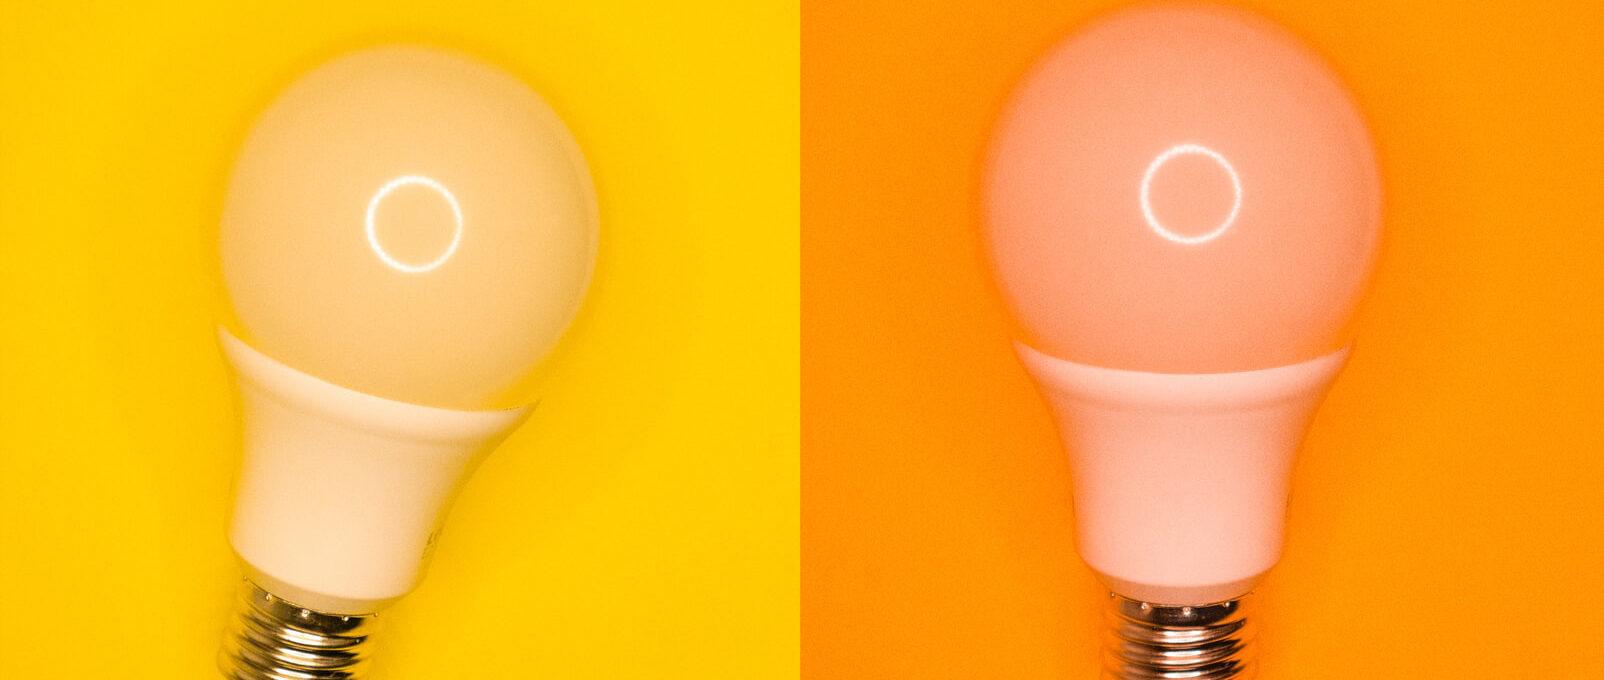 Yellow and orange light bulb representing energy training